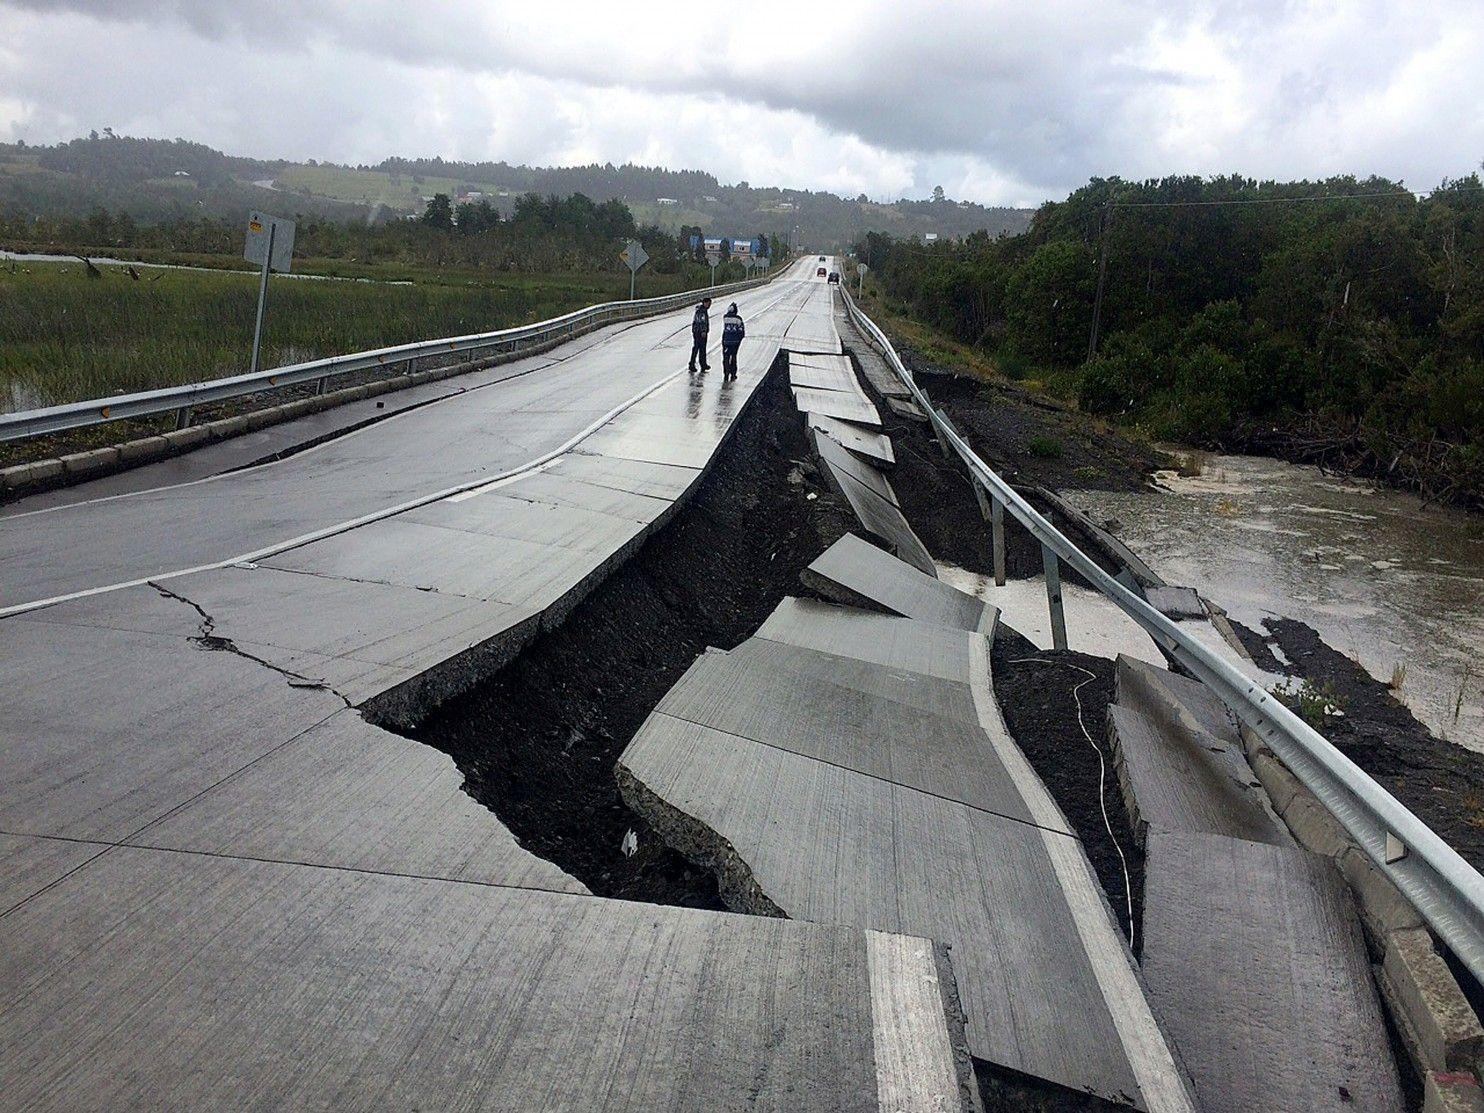 California Quake Map Usgs%0A Major quake jolts Chile resort region         homes lose power